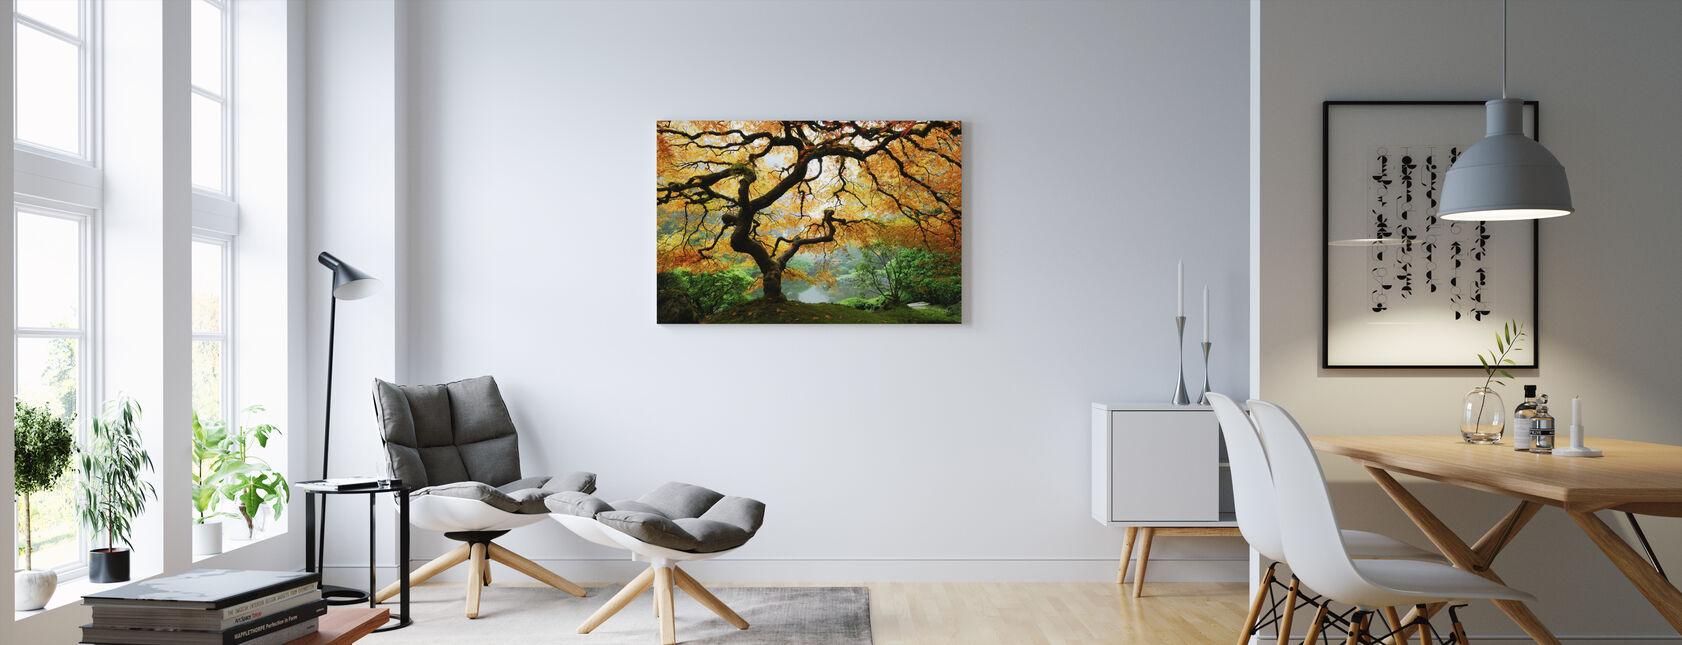 Autumn Maple - Canvas print - Living Room